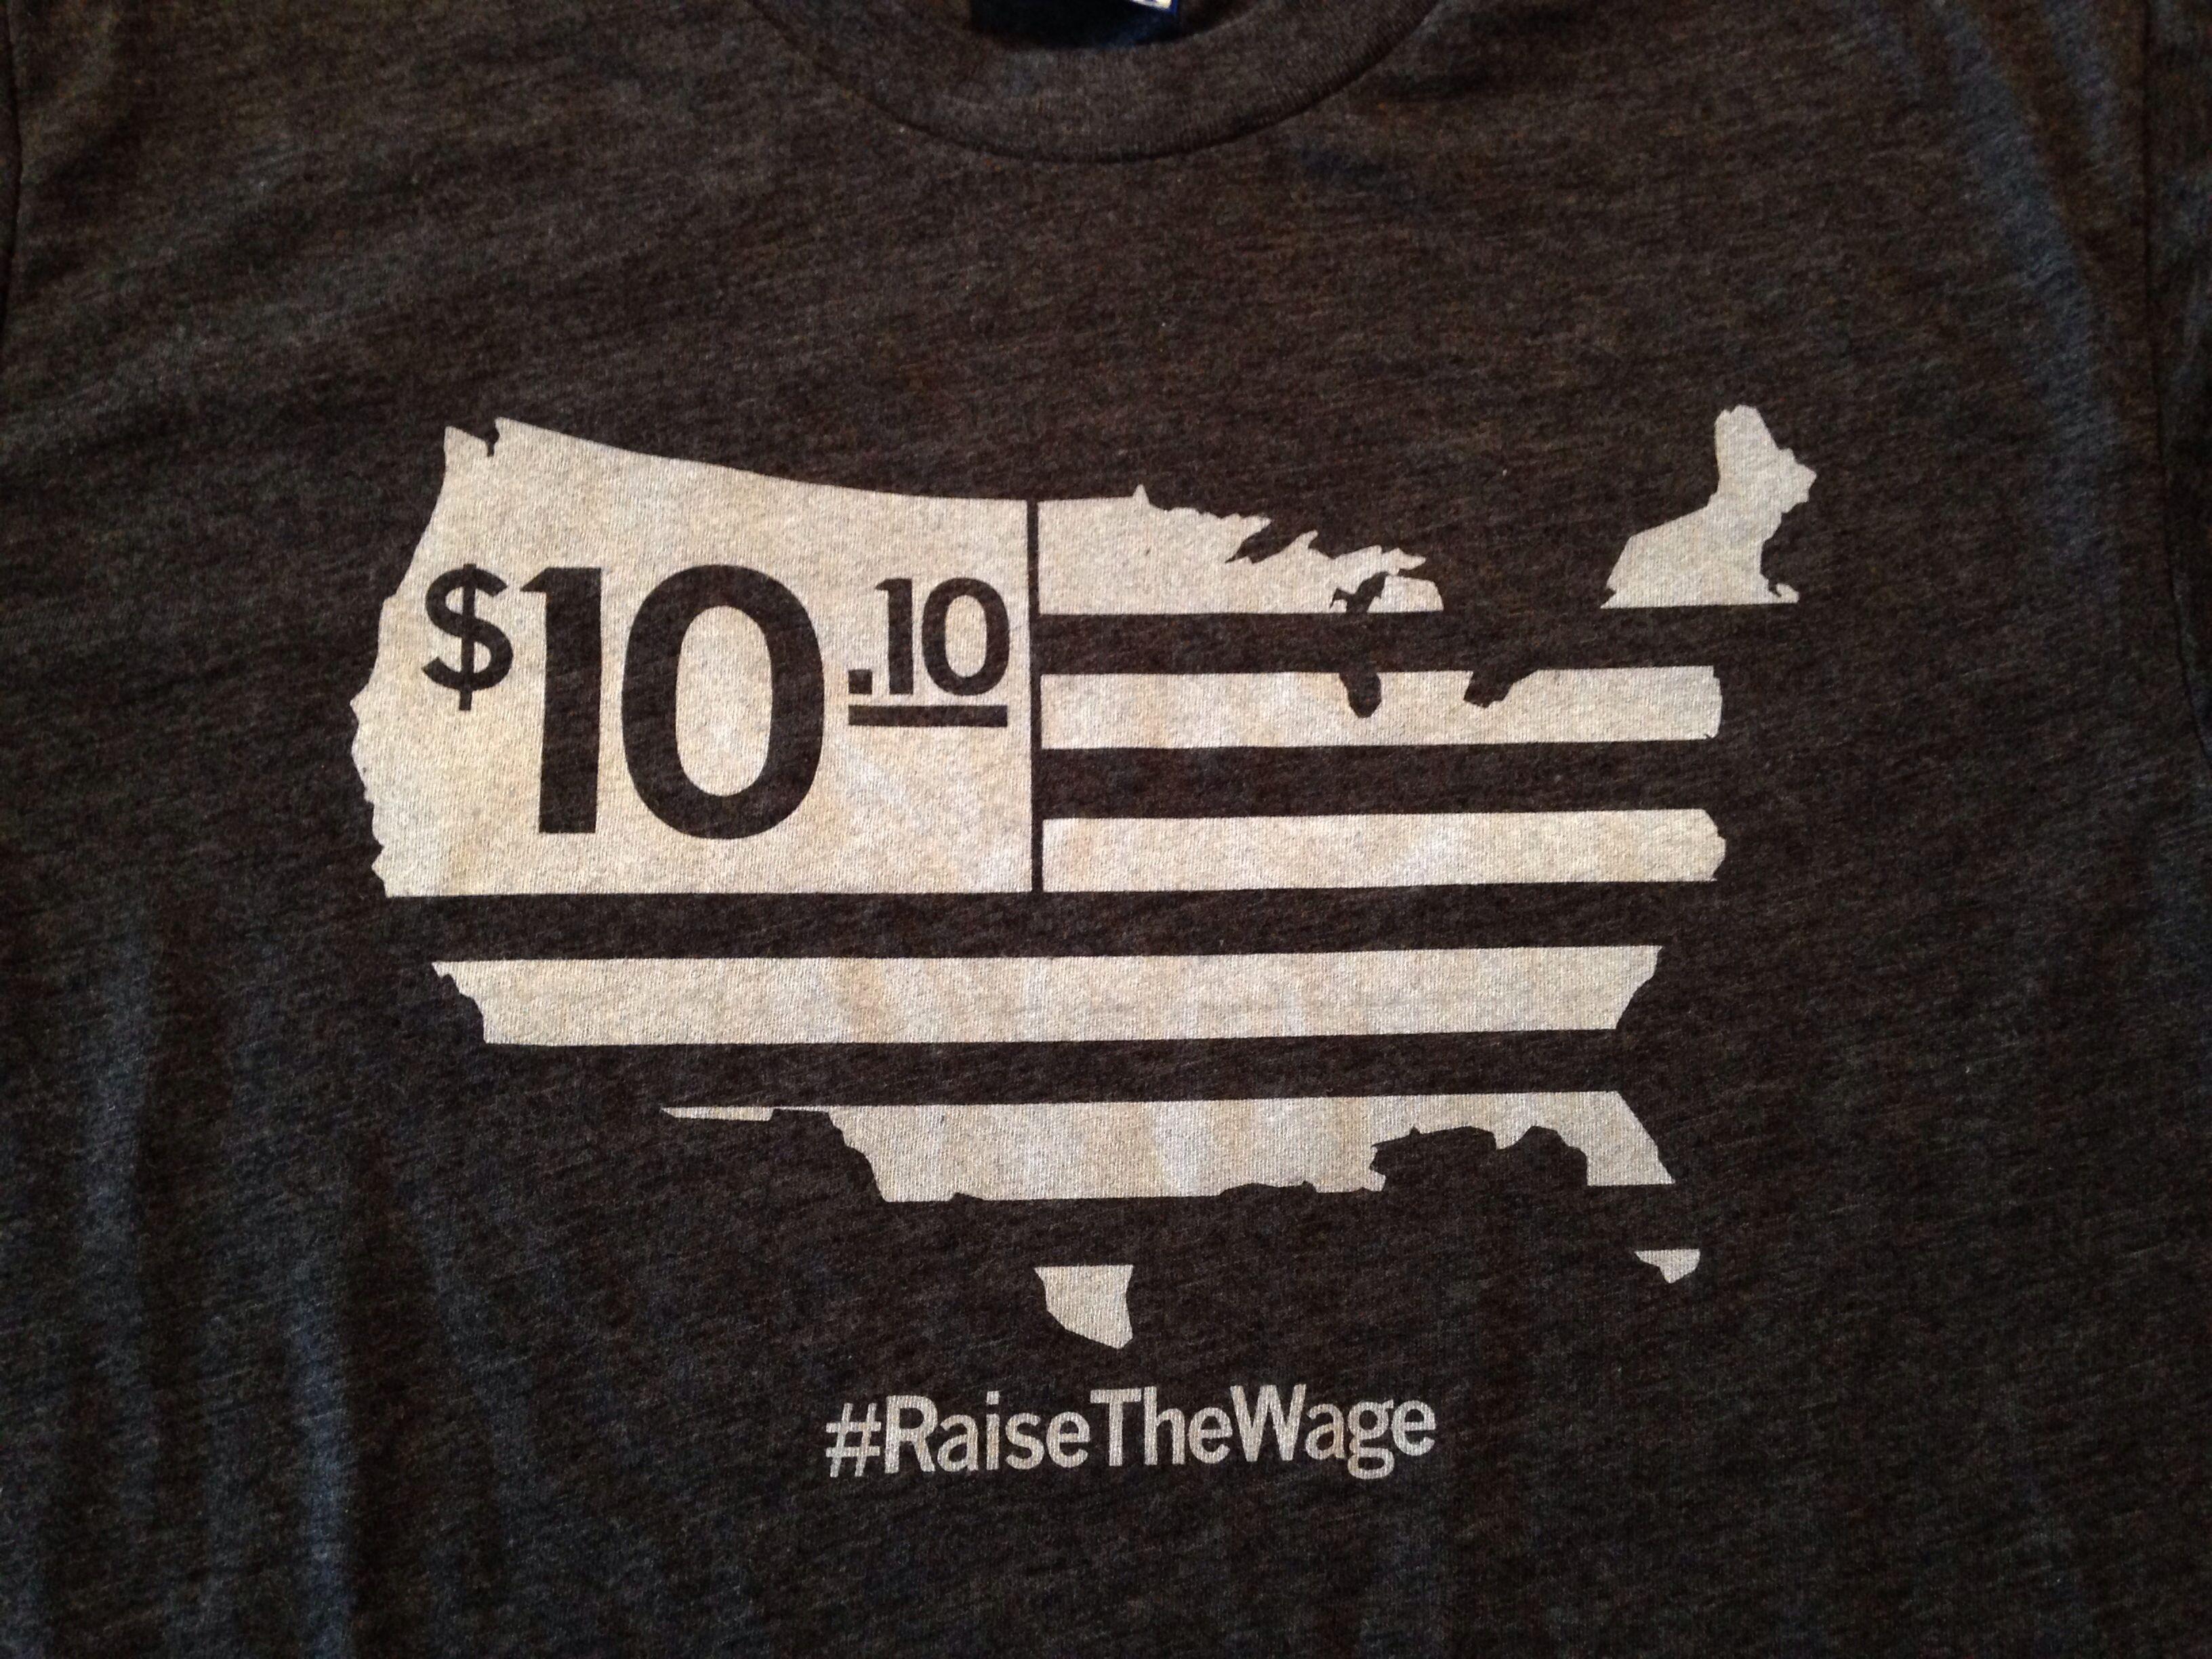 Raygun #RaisetheWage shirt